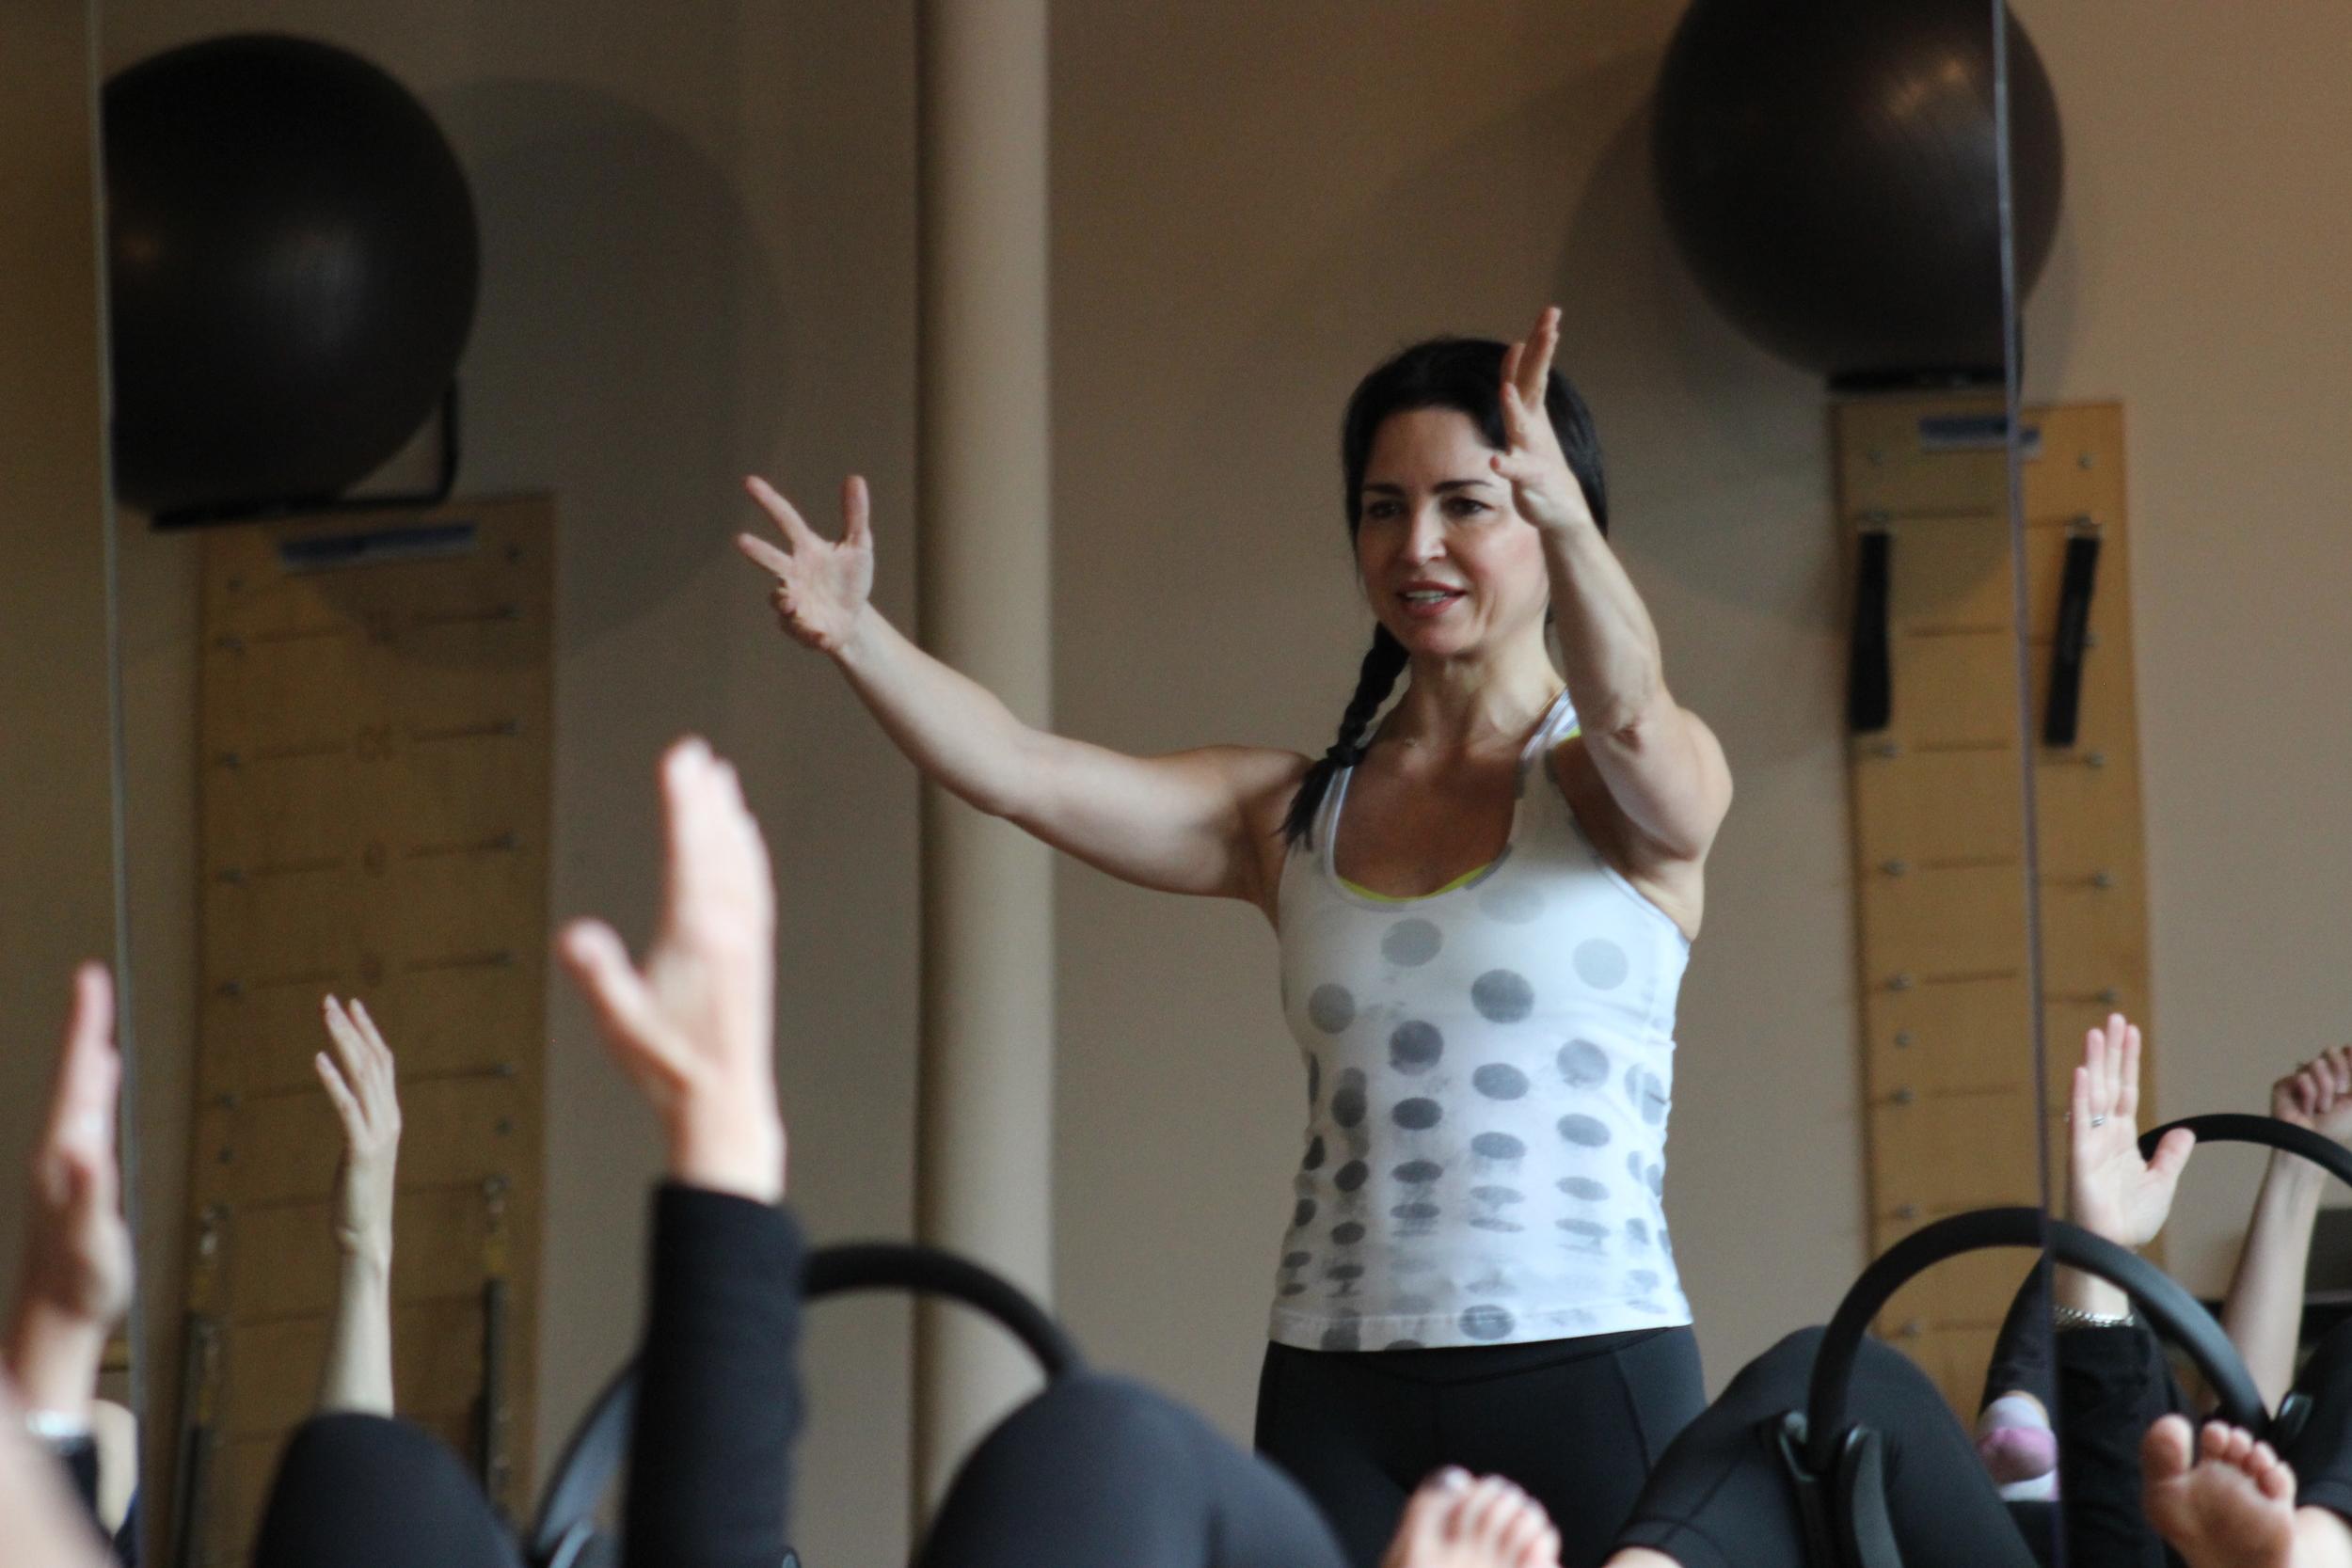 mat-fitness-classes-chicago